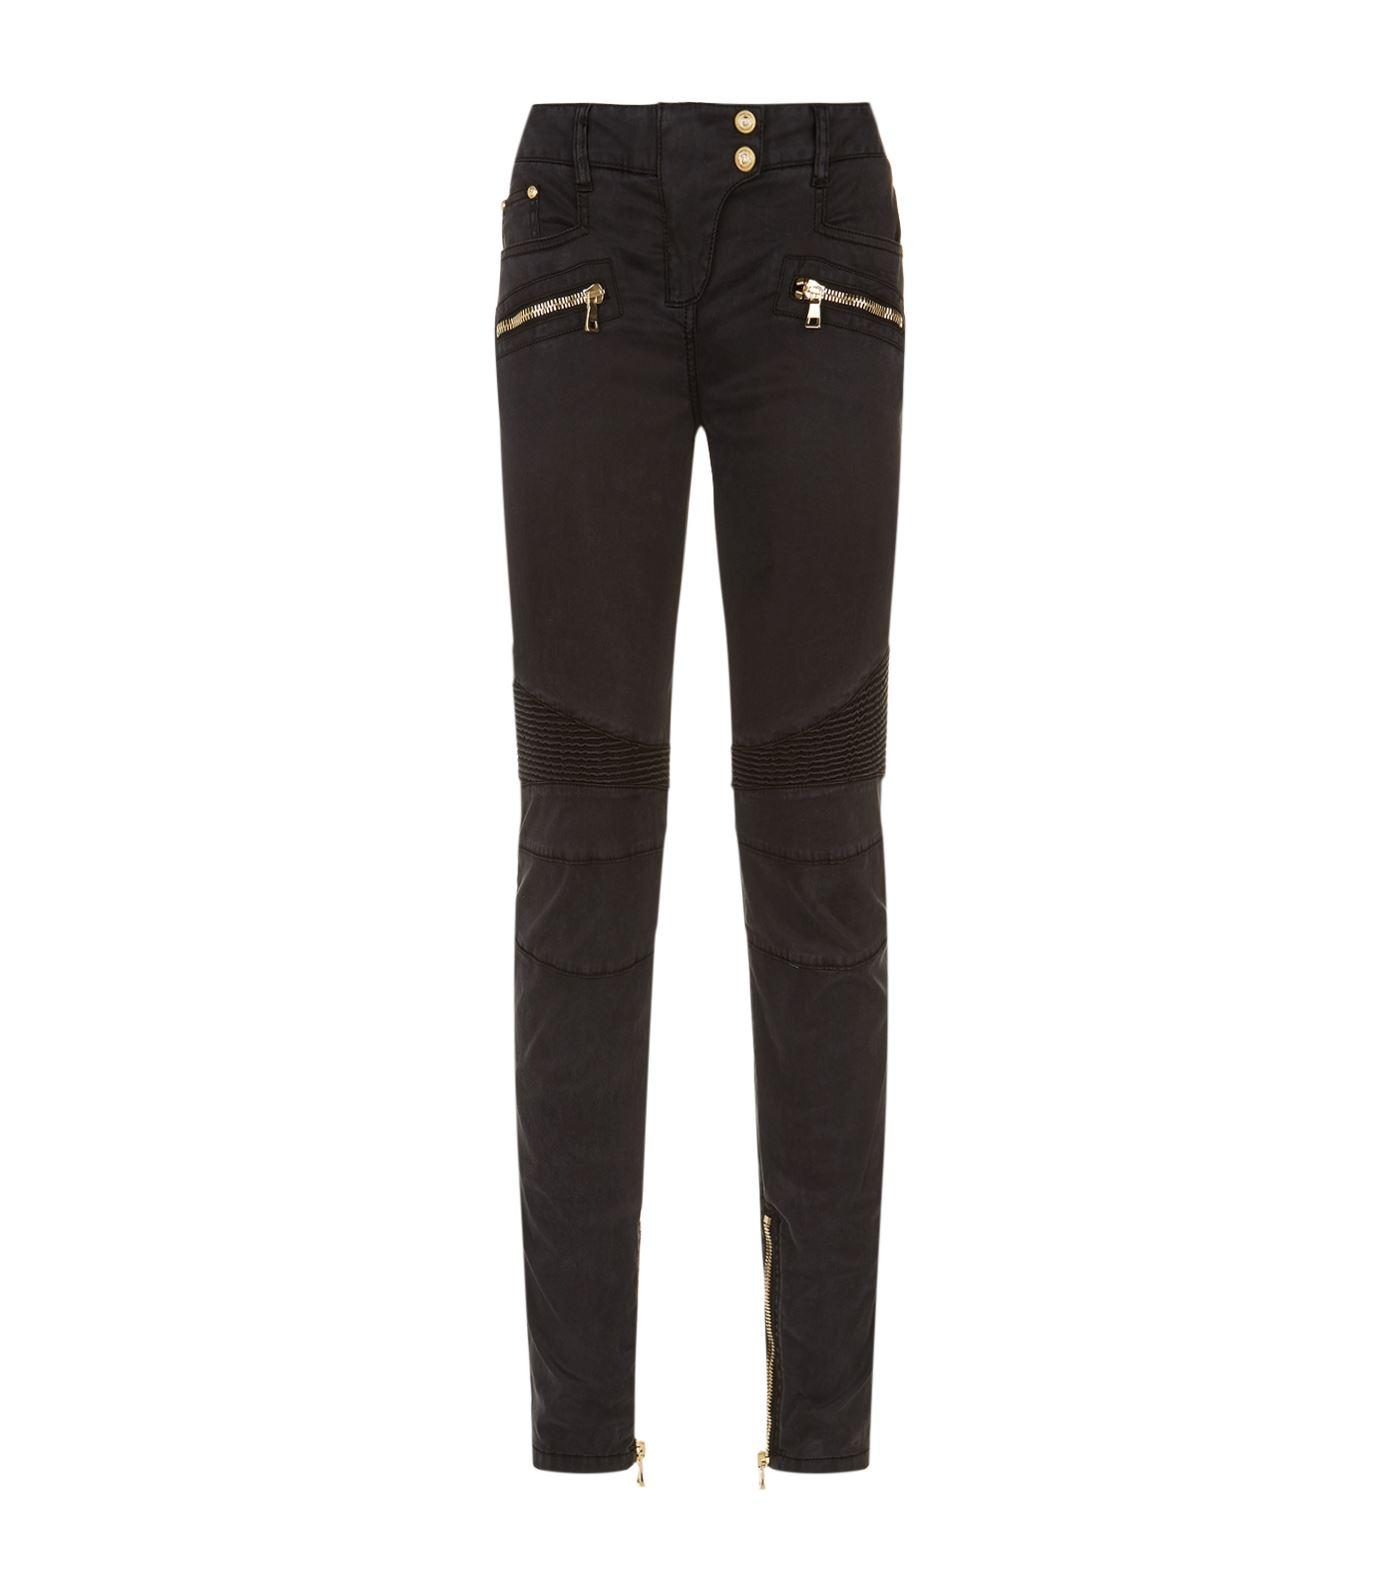 Balmain Sateen Biker Jeans In Black